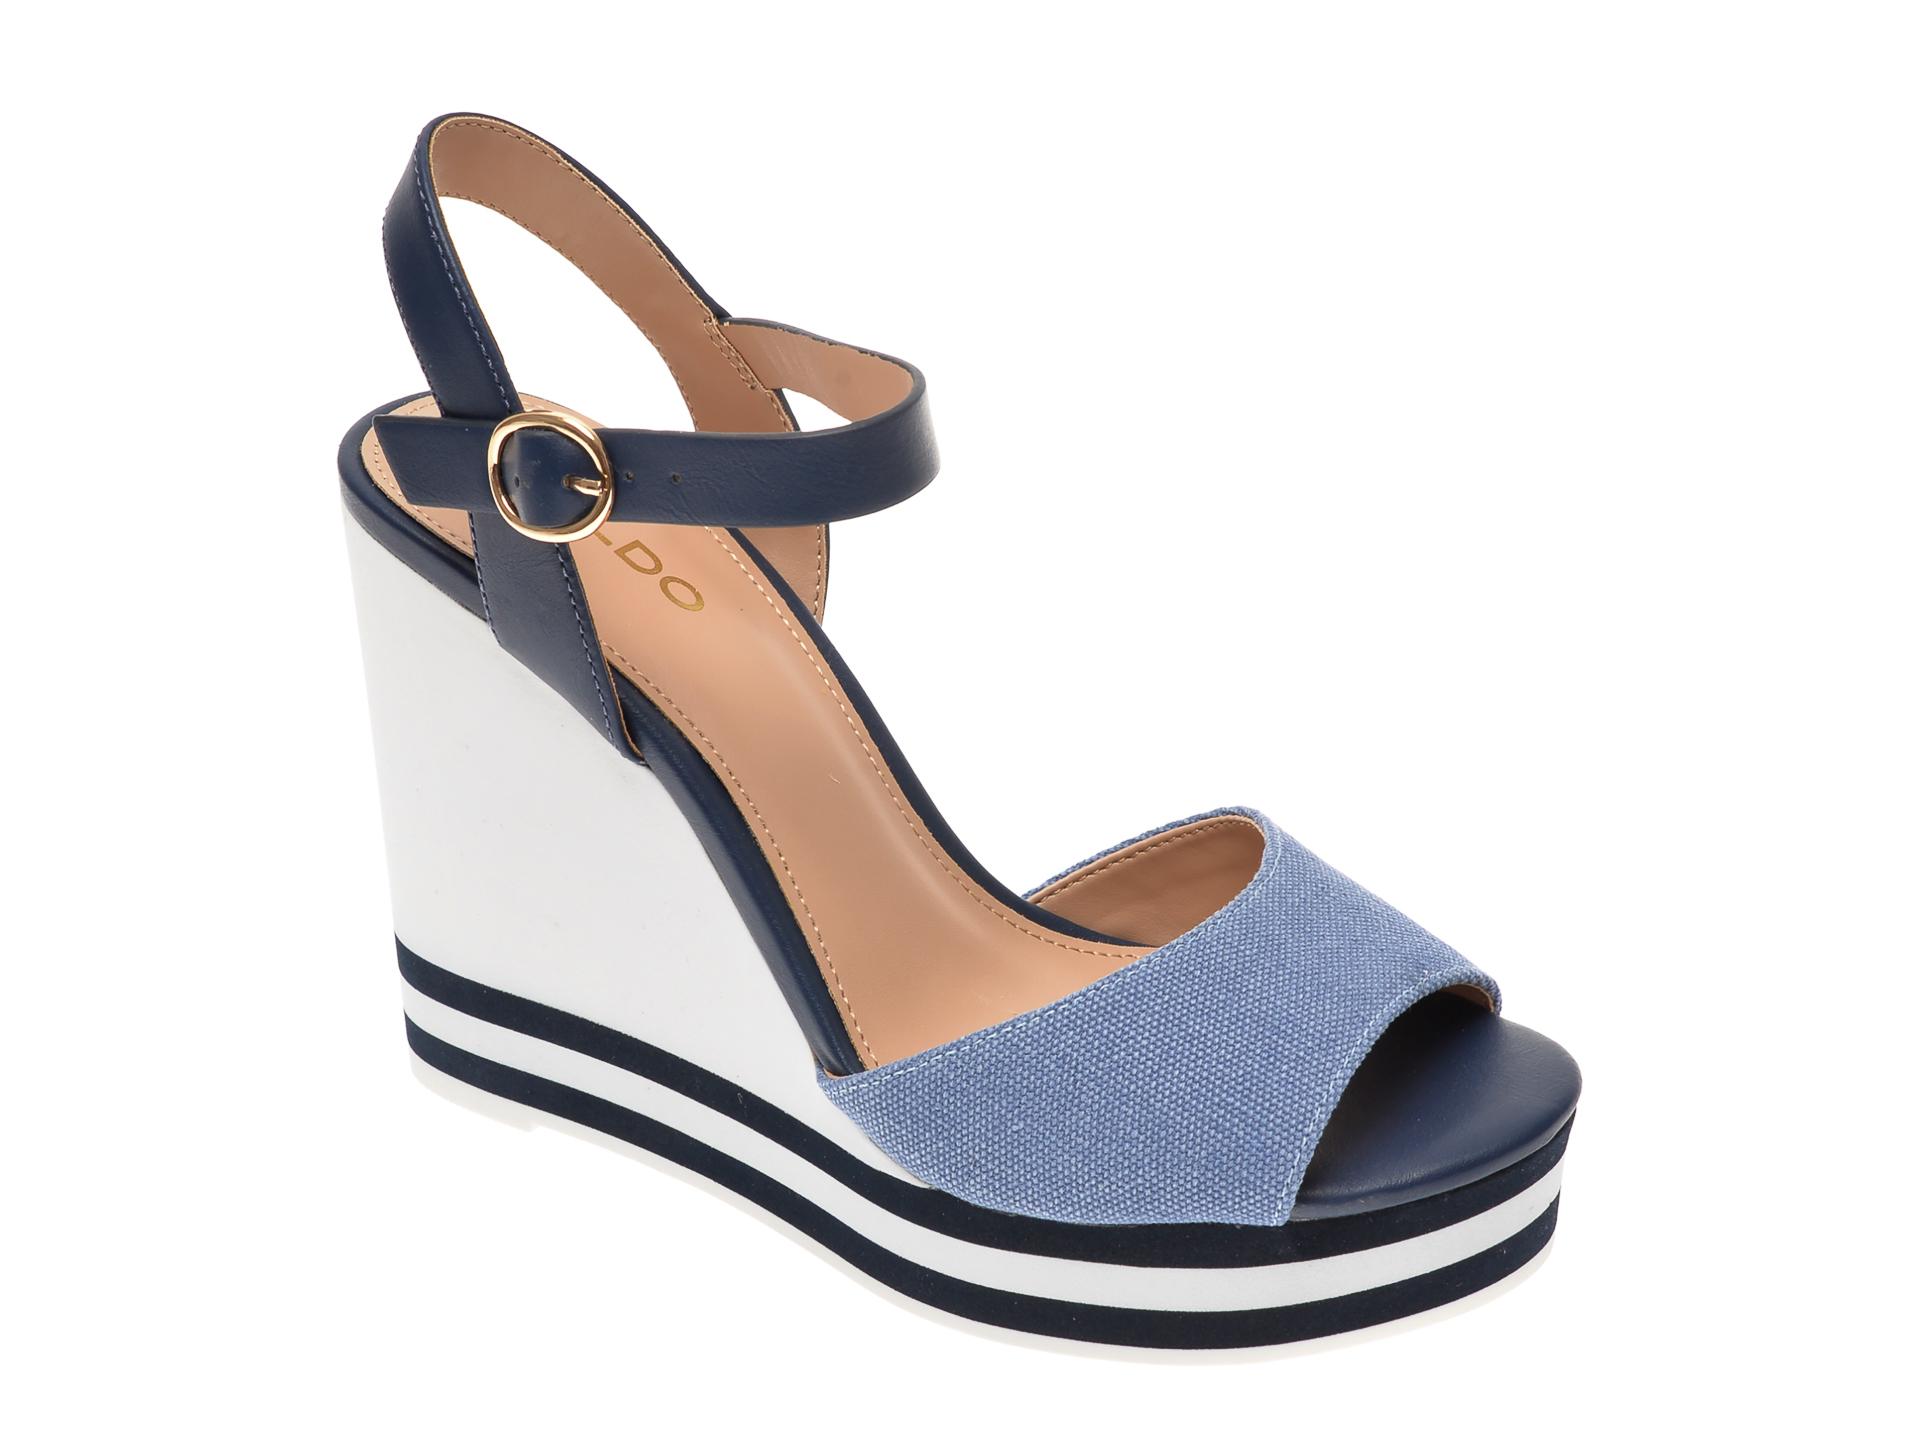 Sandale ALDO bleumarin, Broa410, din material textil